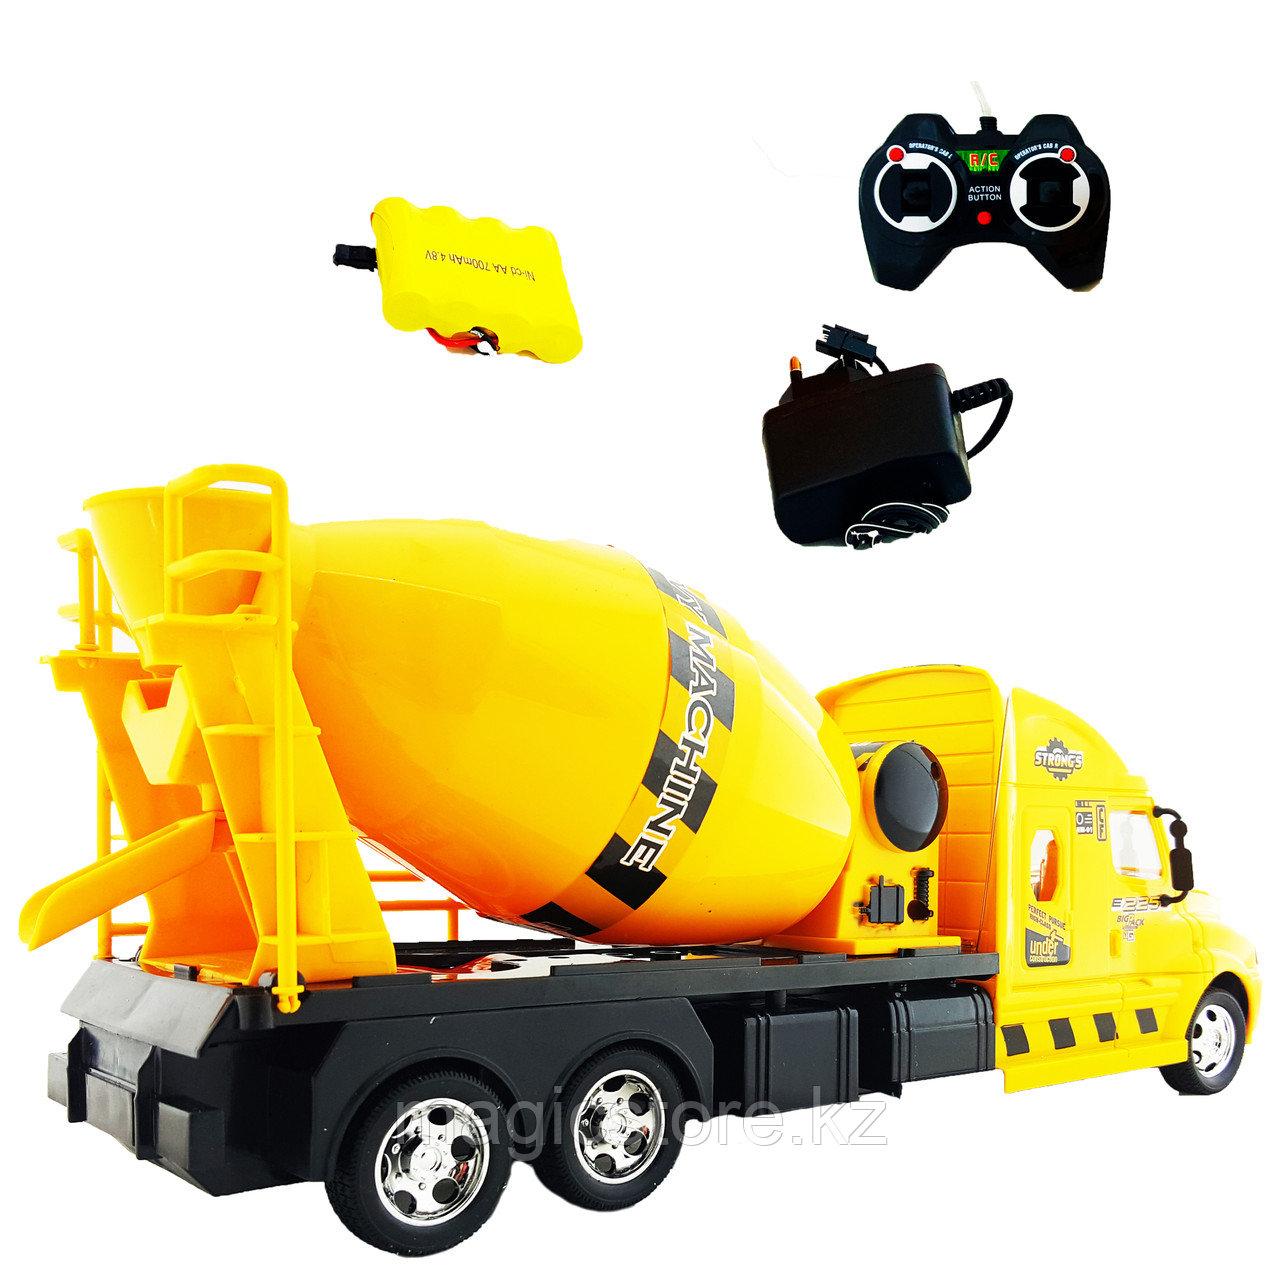 Truck Trailblazer R/C Trough Tipper Спецтехника Радиоуправляемая Бетономешалка, звук и свет - фото 2